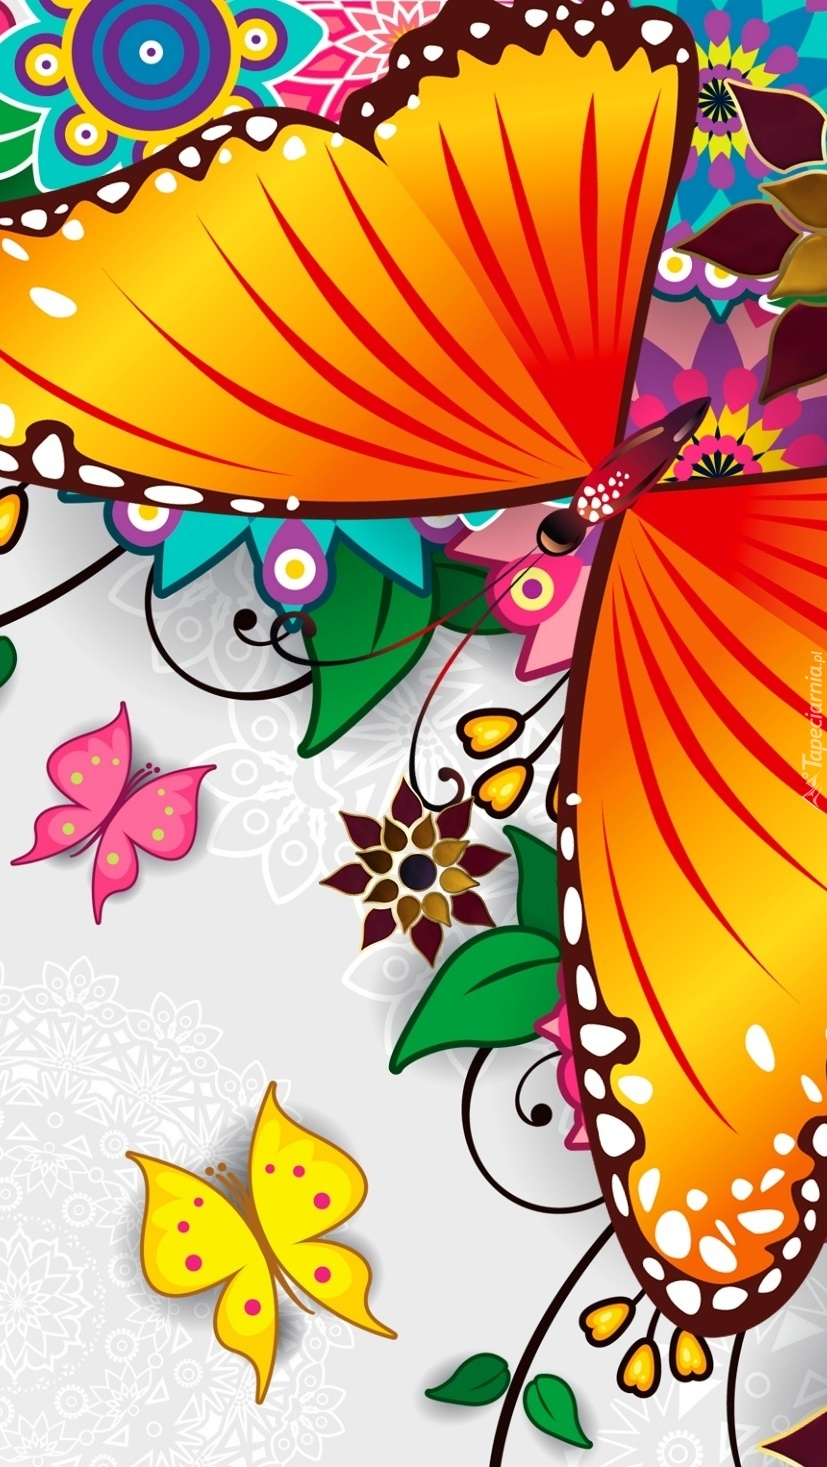 Motyle w grafice